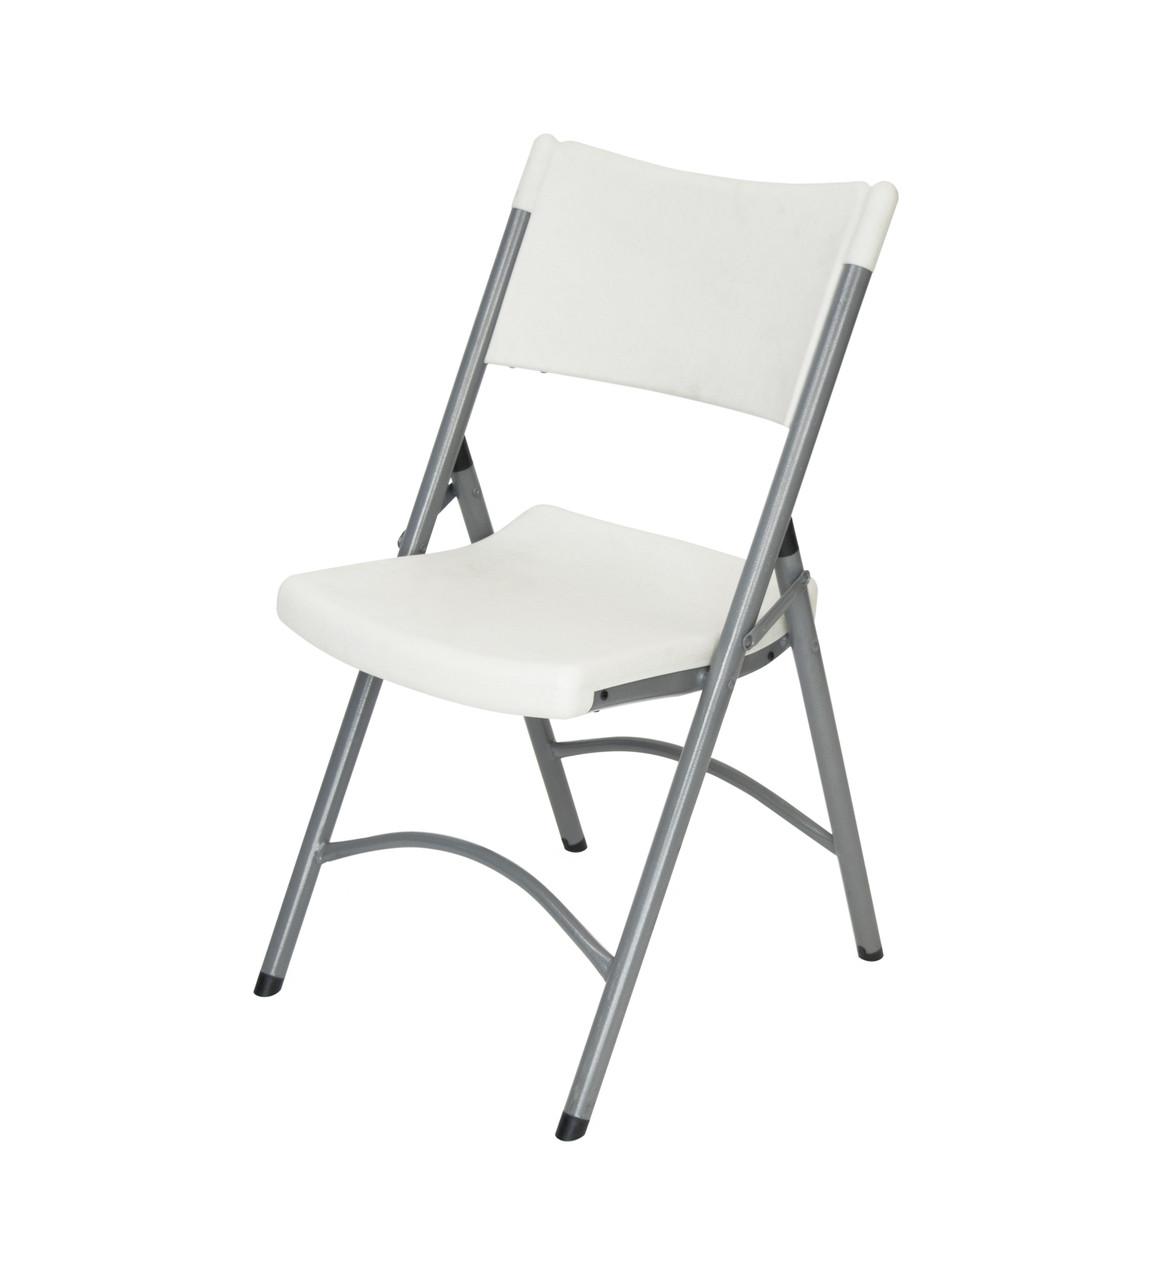 Astounding Classic Series White Granite Blow Molded Plastic Folding Chair Interior Design Ideas Apansoteloinfo